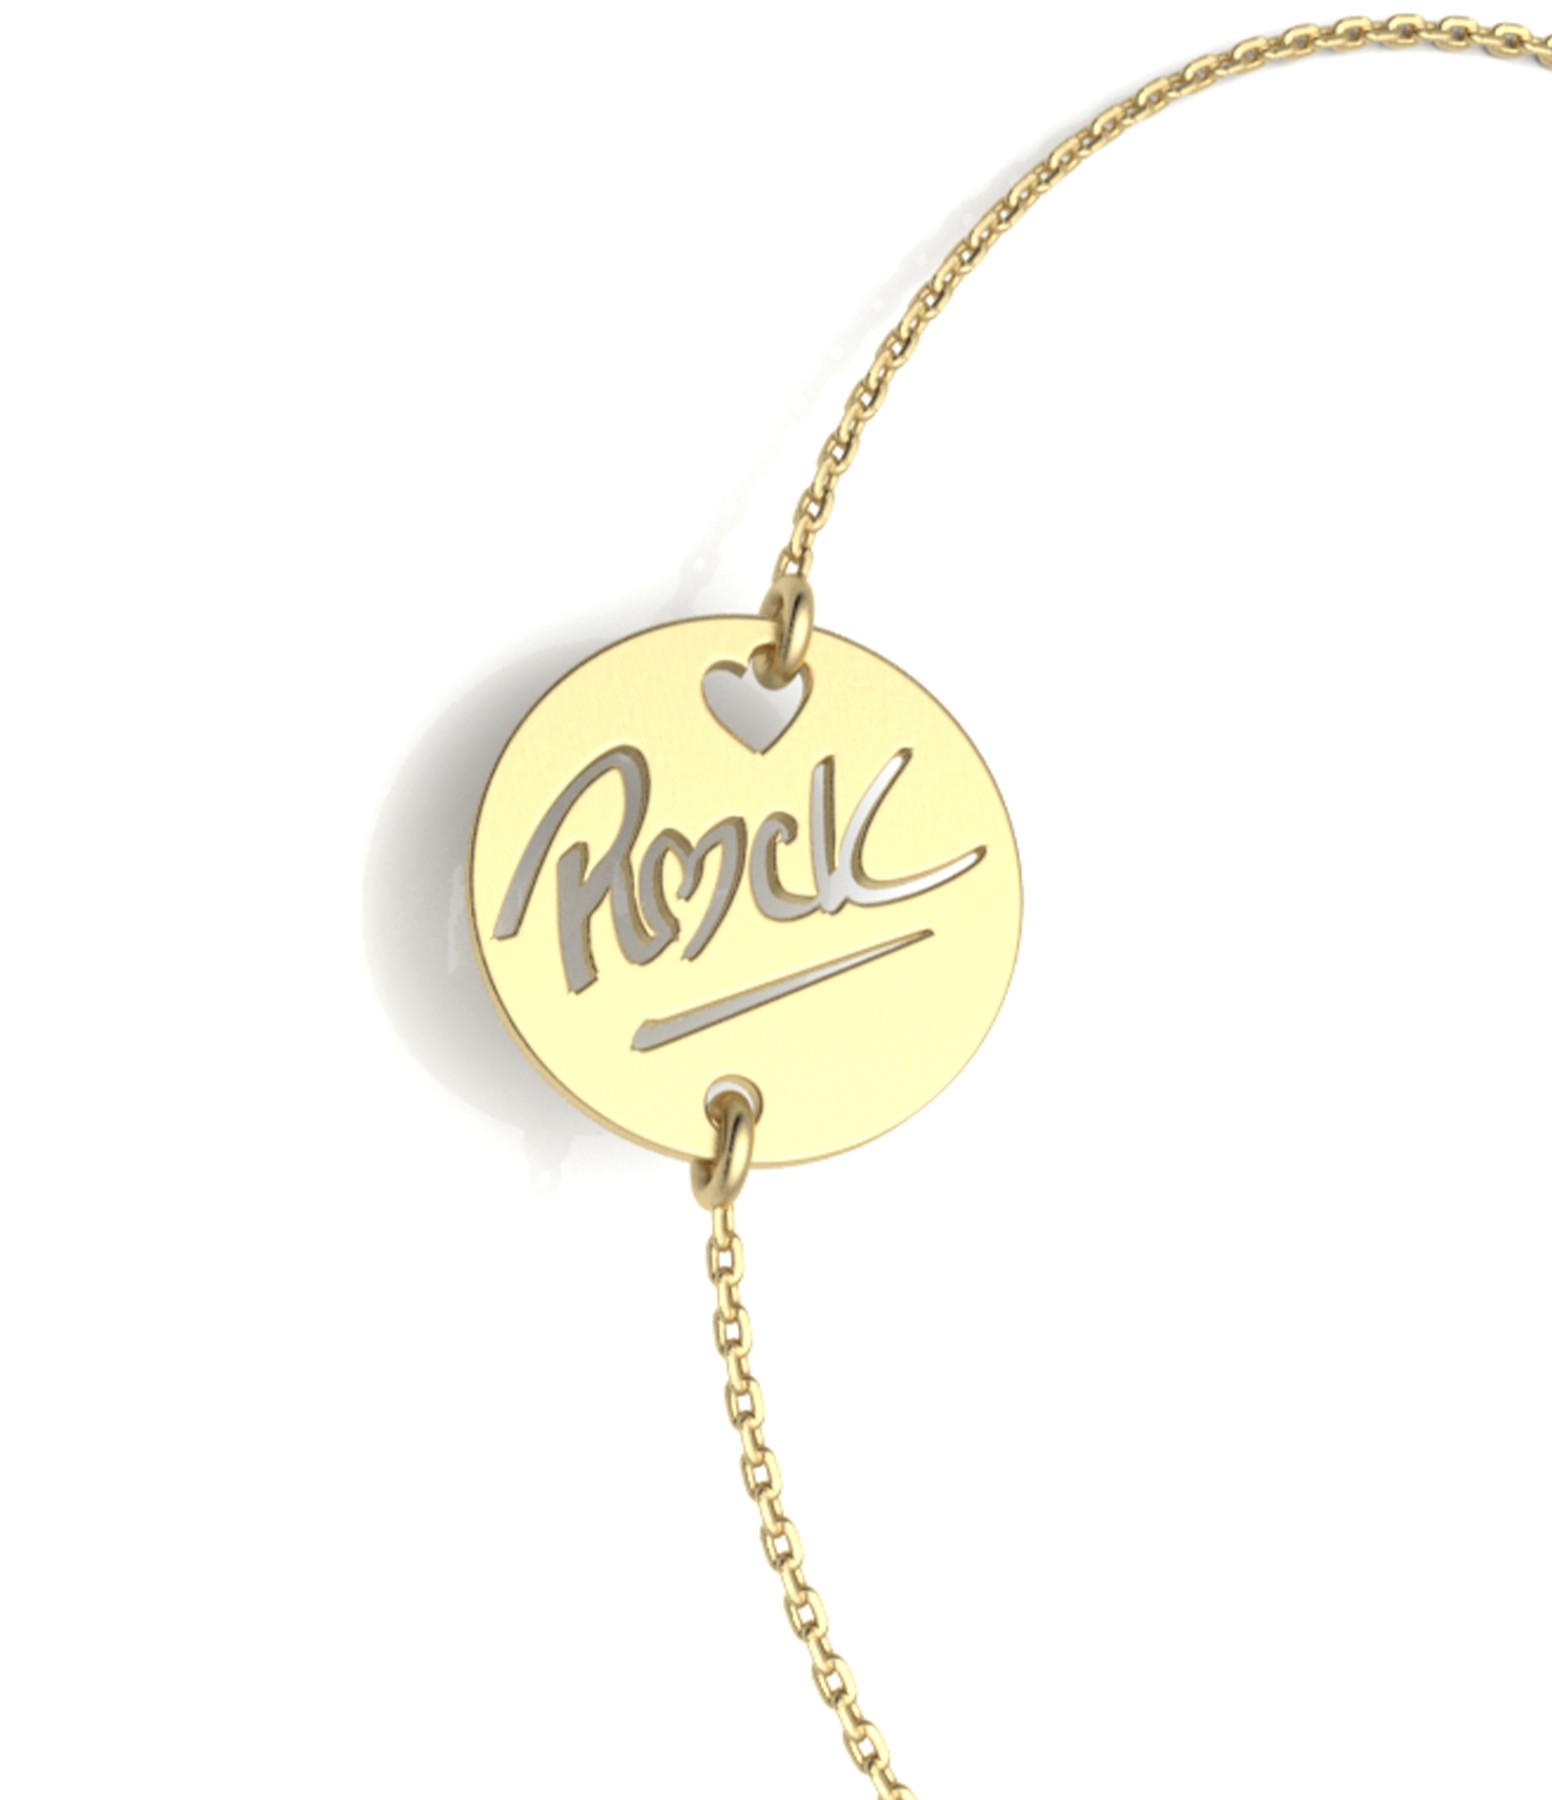 NAVA JOAILLERIE - Bracelet Rock S Or Jaune